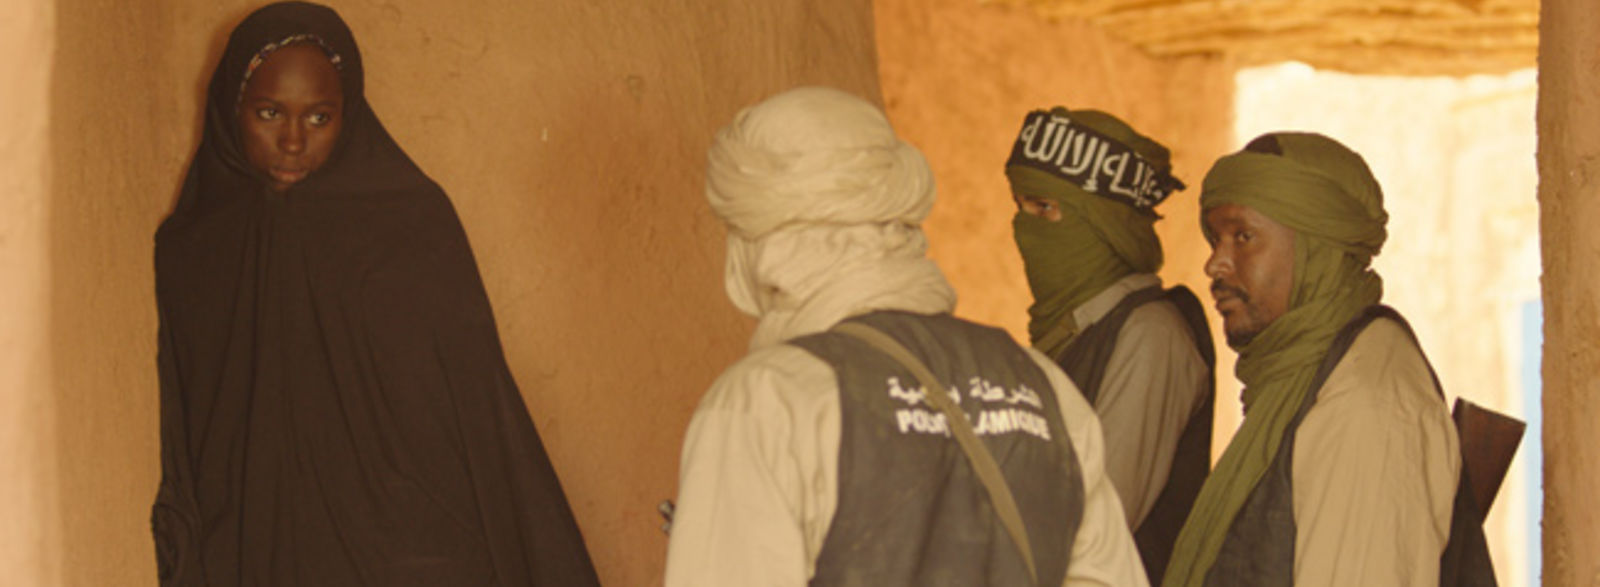 Cannes 2014 : «Timbuktu» d'A. Sissako; «Eau argentée» d'O. Mohammed et W. S. Bedirxan